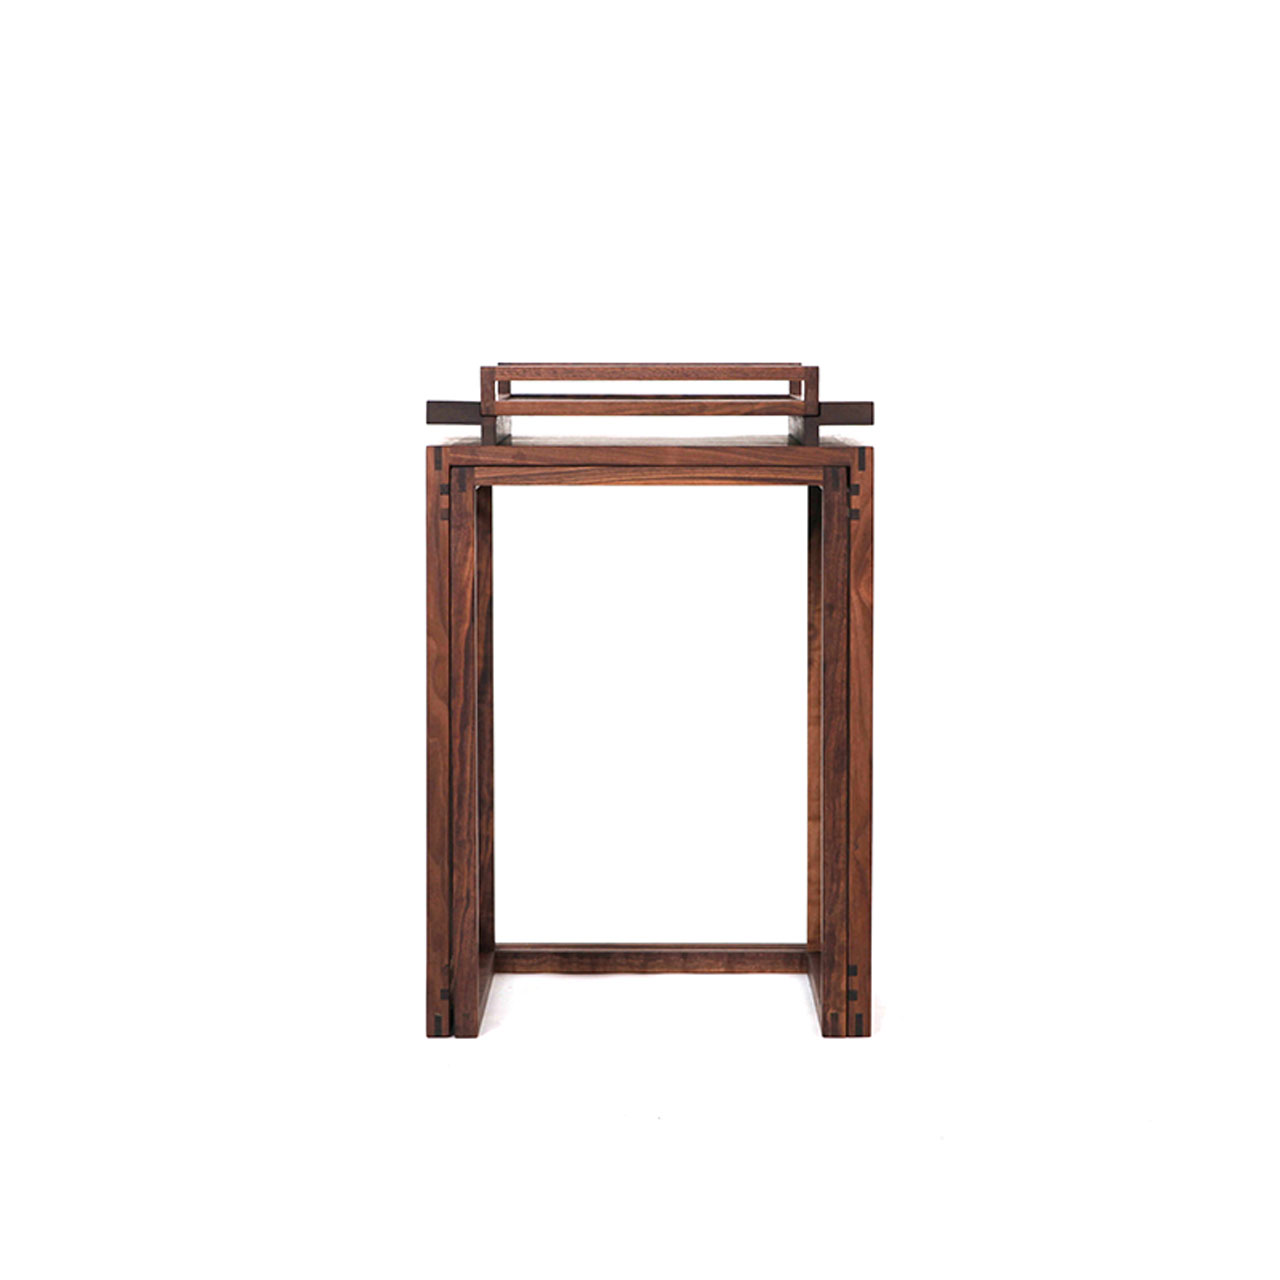 LOGGIA/3 way Side table